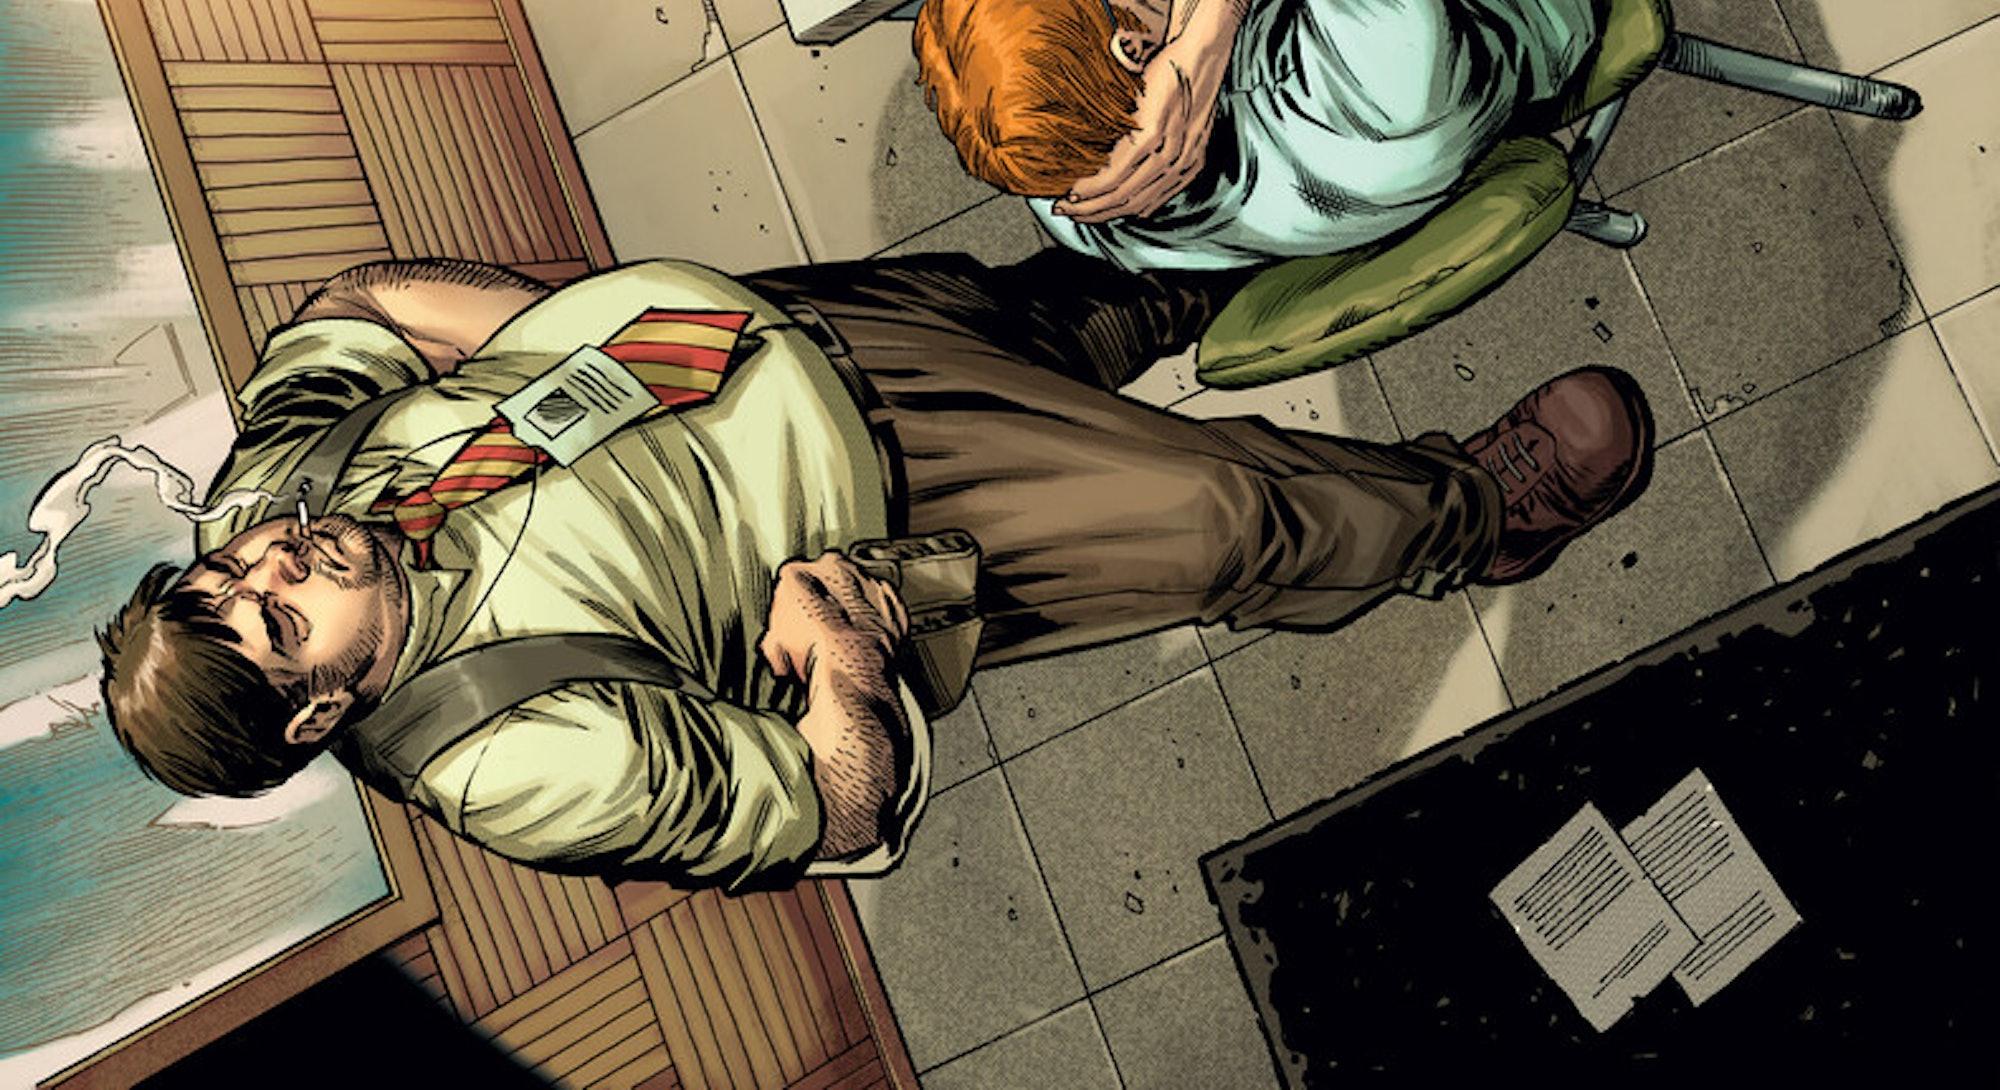 joker a puzzlebox interrogation room scene